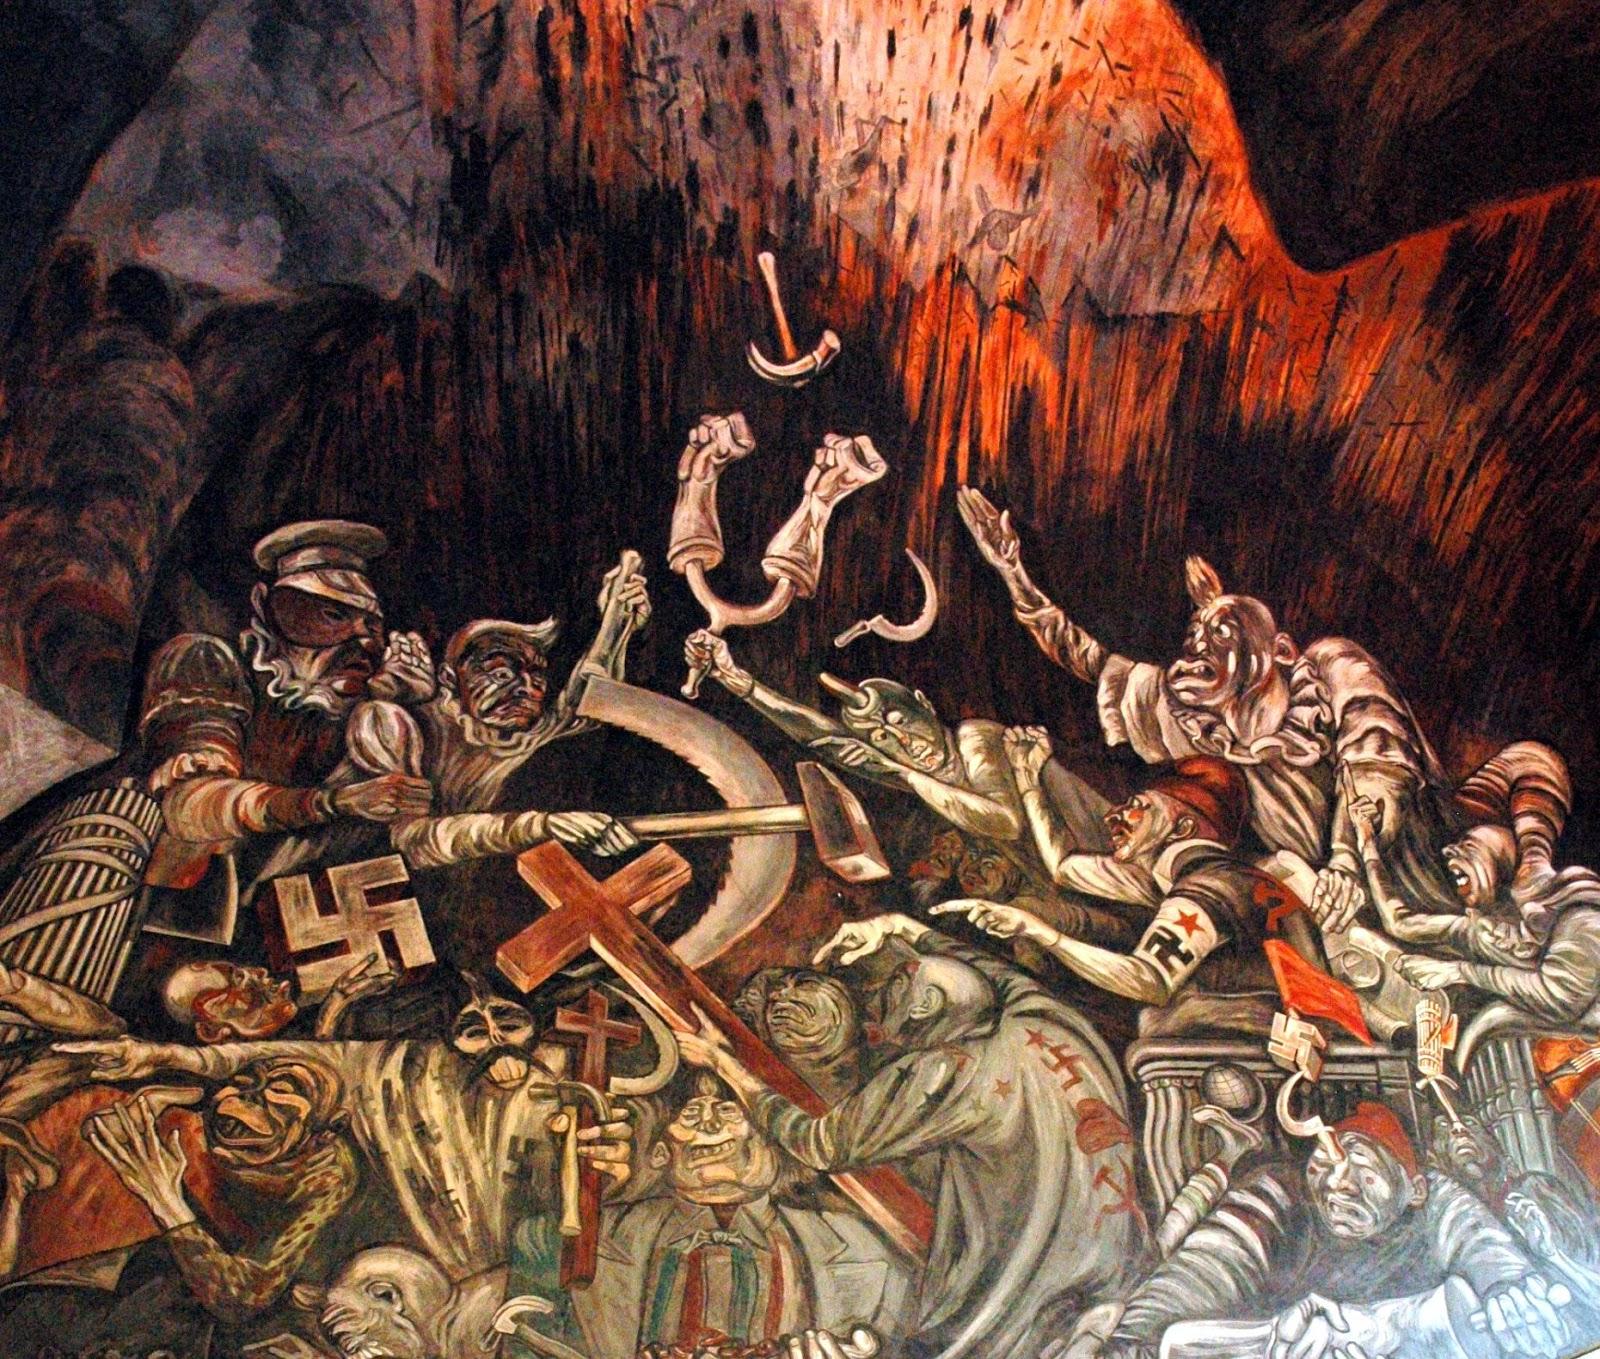 Contra aquellos que nos gobiernan – Lev Tolstói #yamecansé